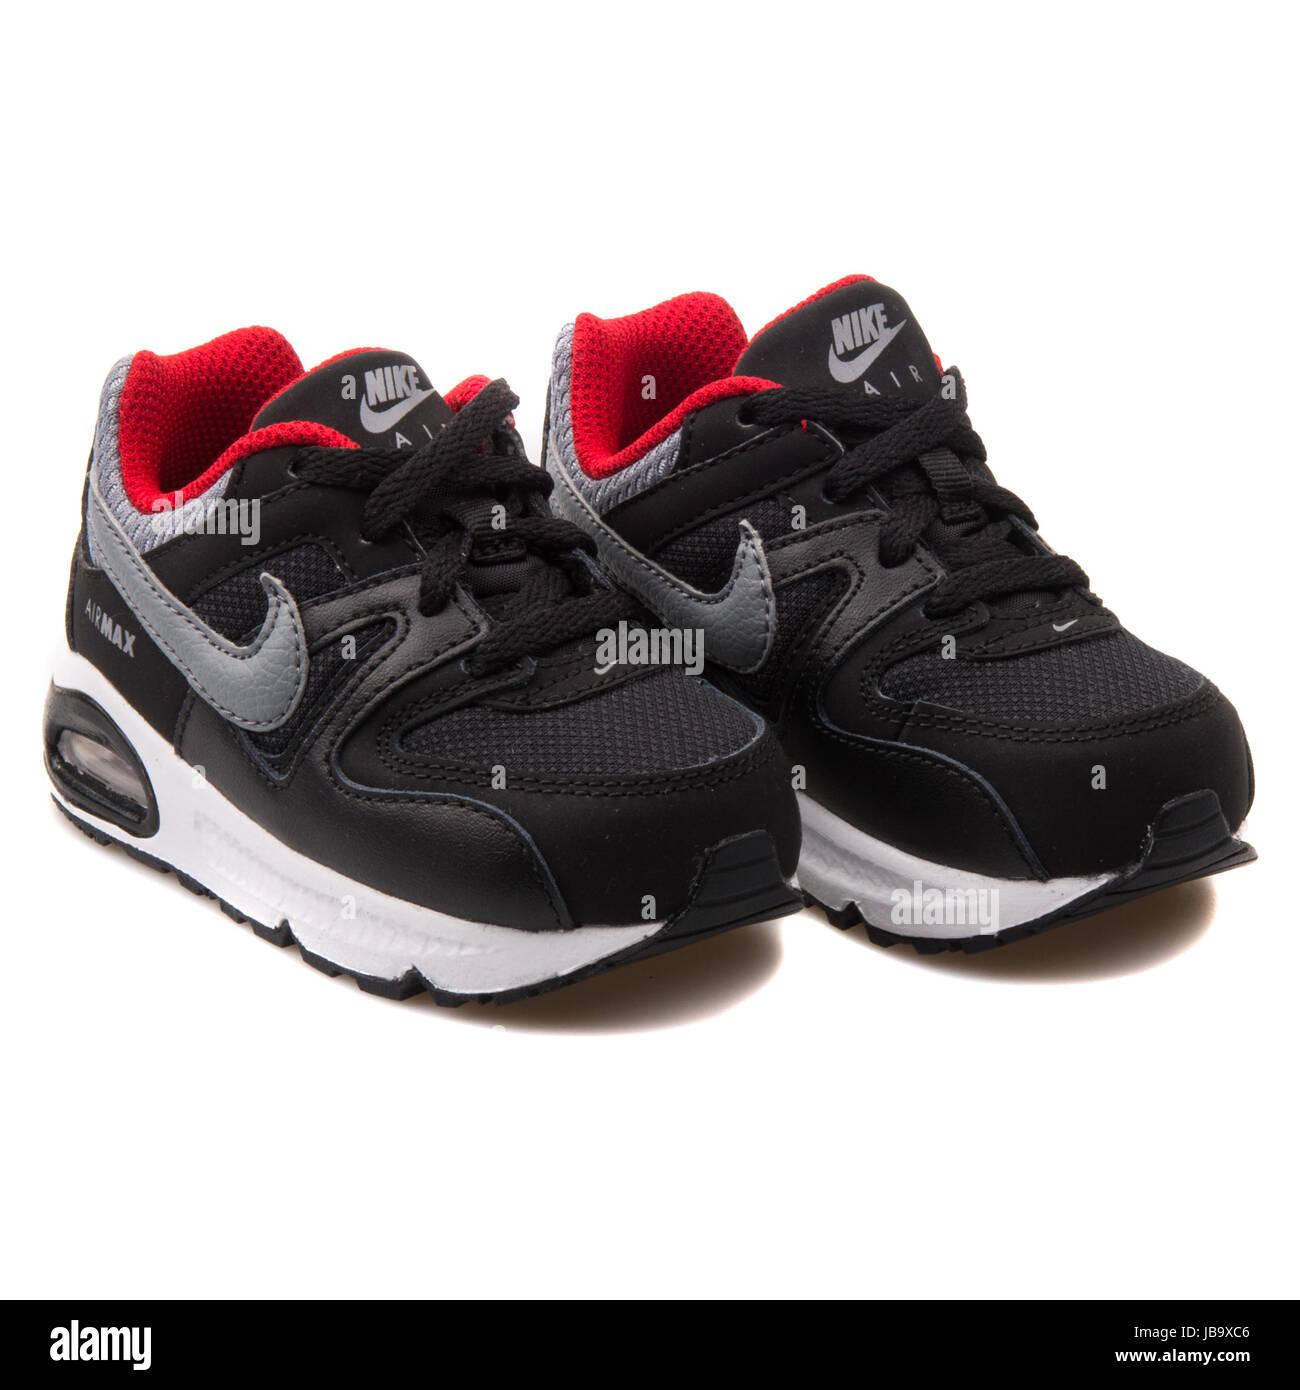 Nike Air Max Command Unisex